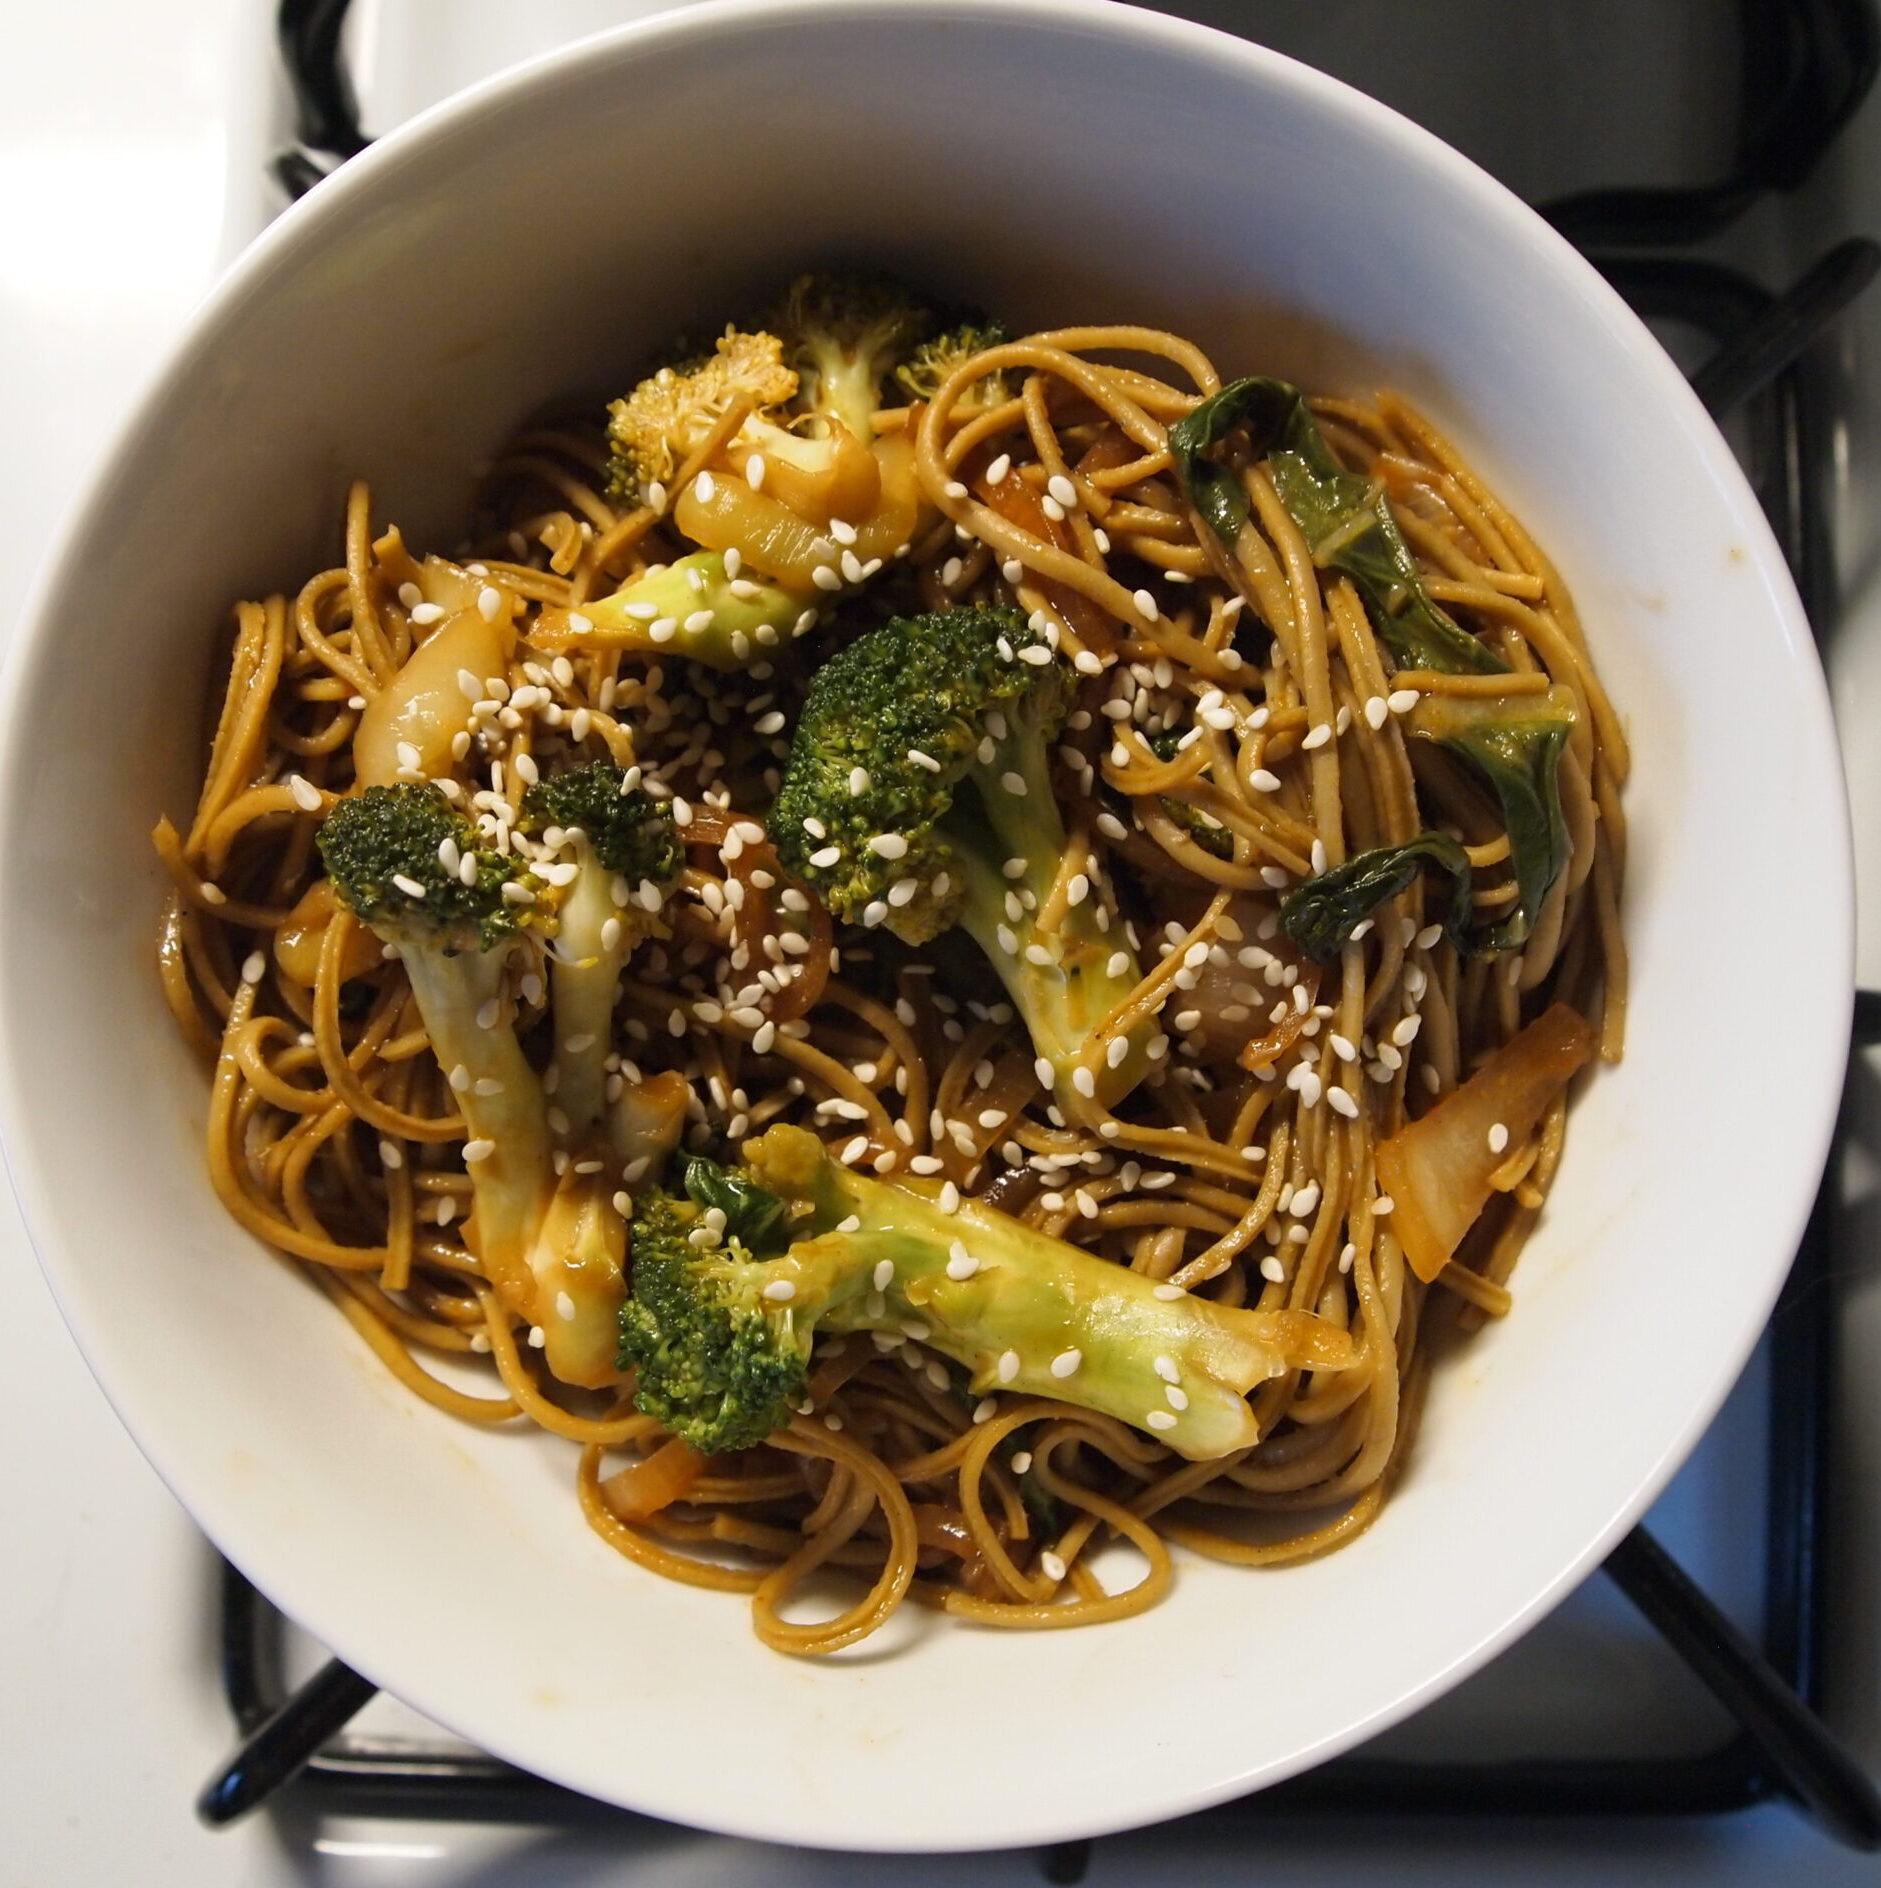 Broccoli & Bok Choy Noodle Bowl